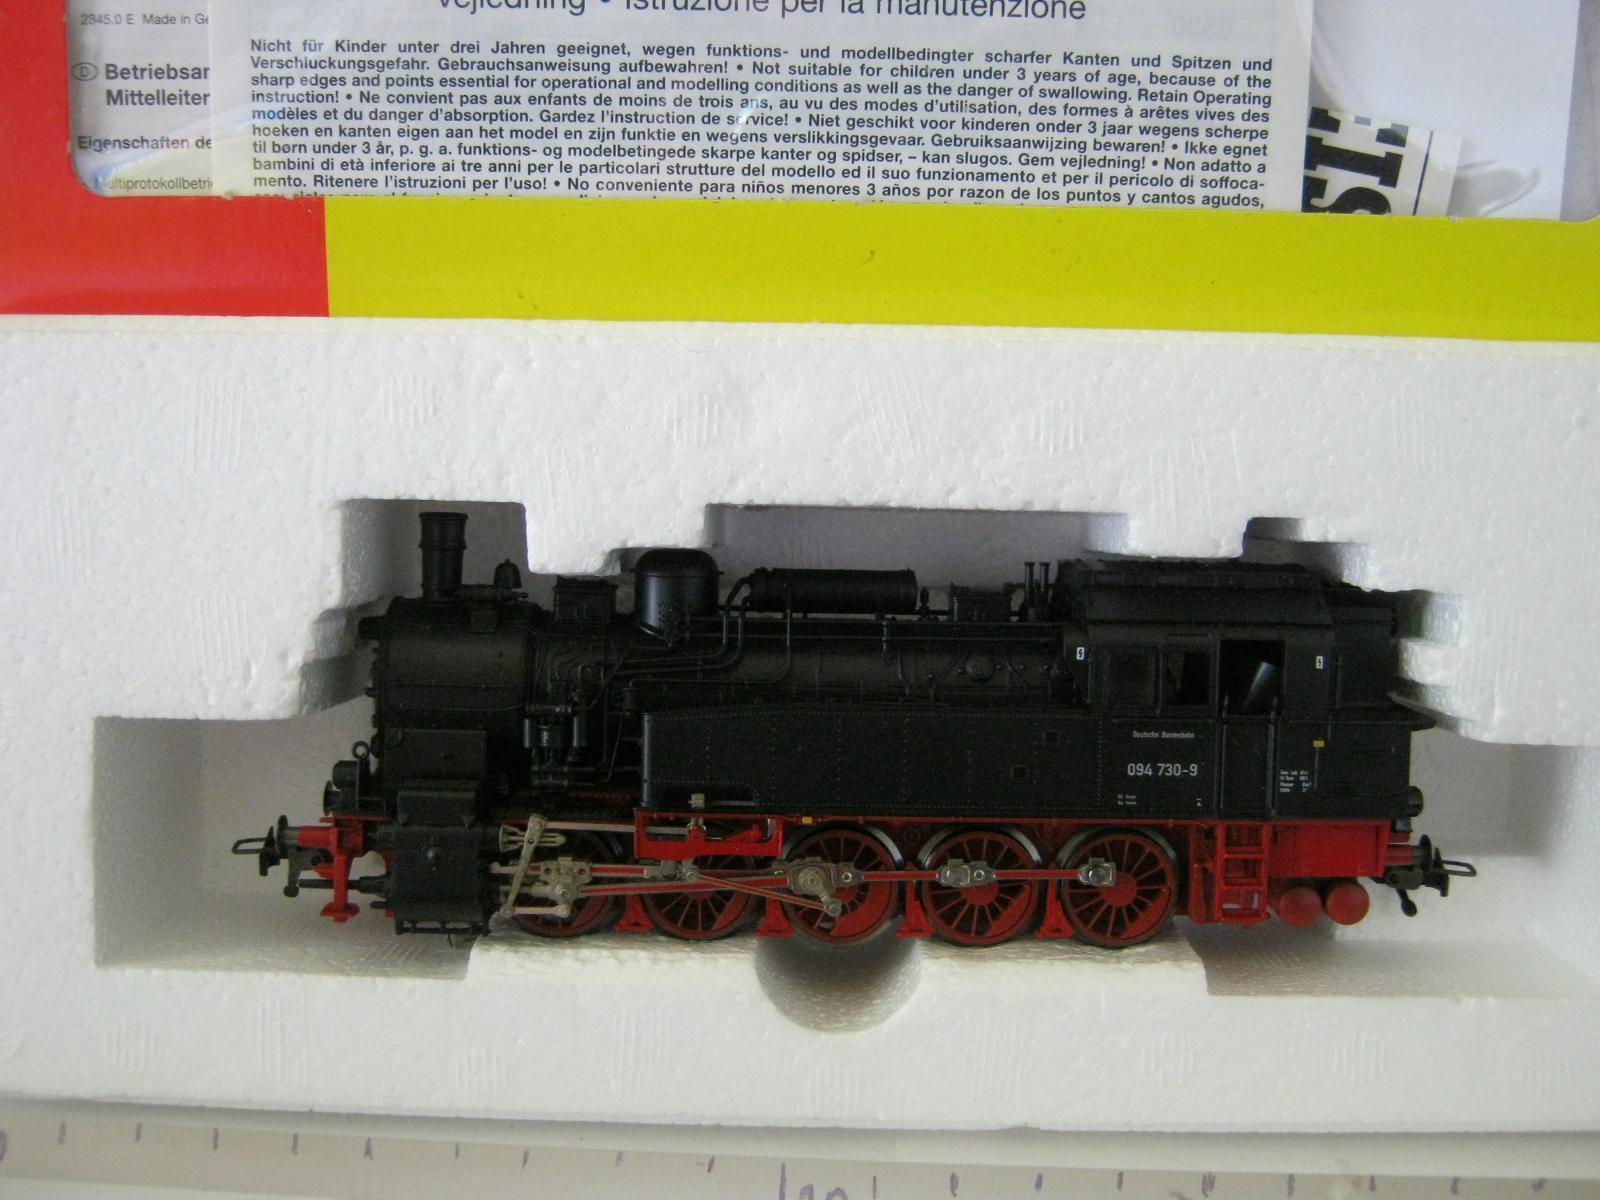 Digital Fleischmann HO AC 931094 Dampf - Lok BR 094 730-9 DB (RG 128S7 2-103)  | Fierce Kaufen